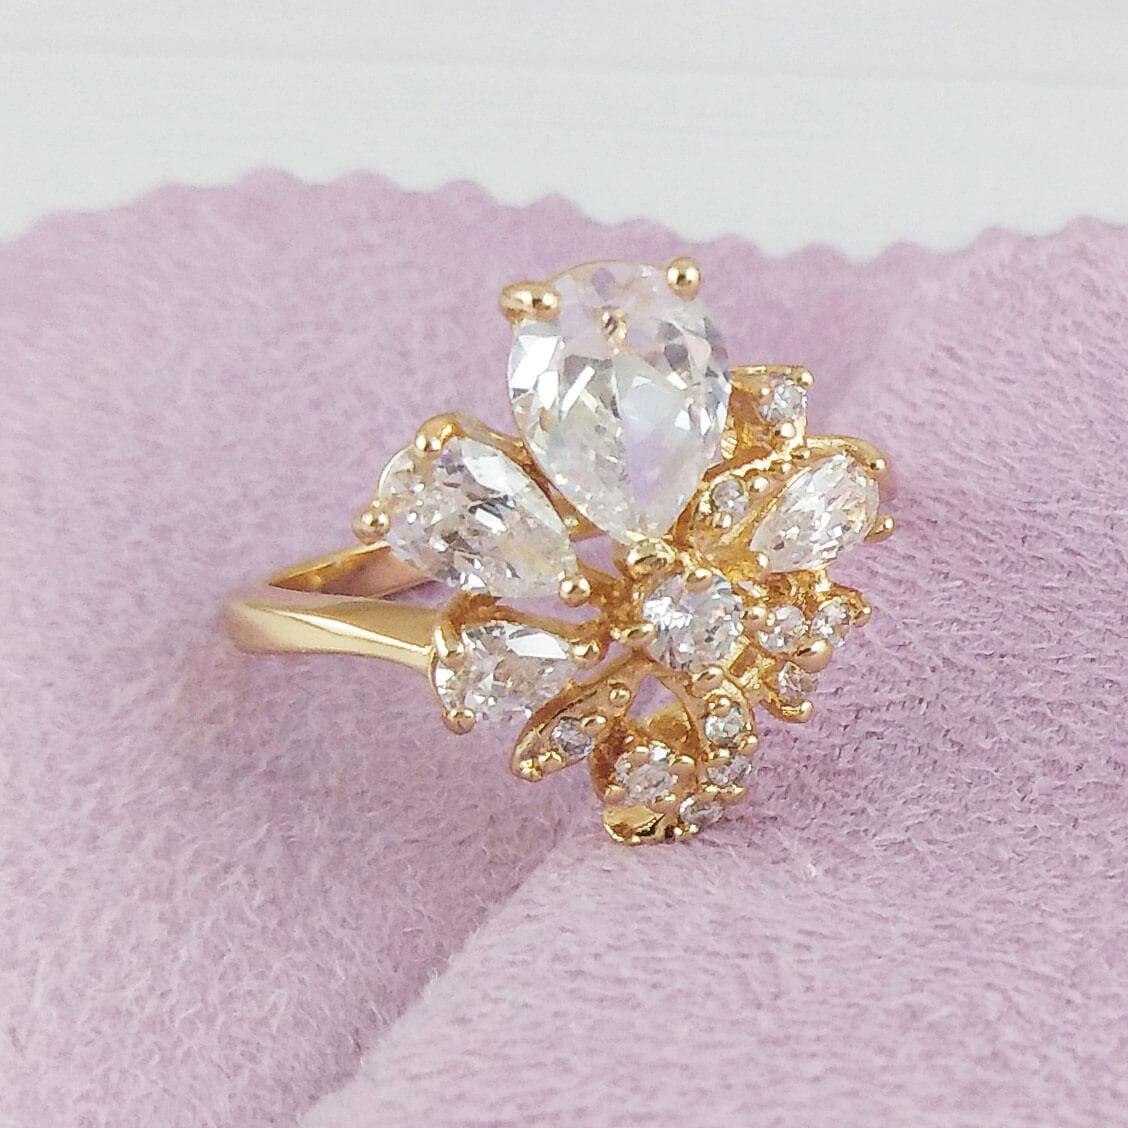 Кольцо Xuping Jewelry размер 19,5 Айви медицинское золото позолота 18К А/В 2-0175